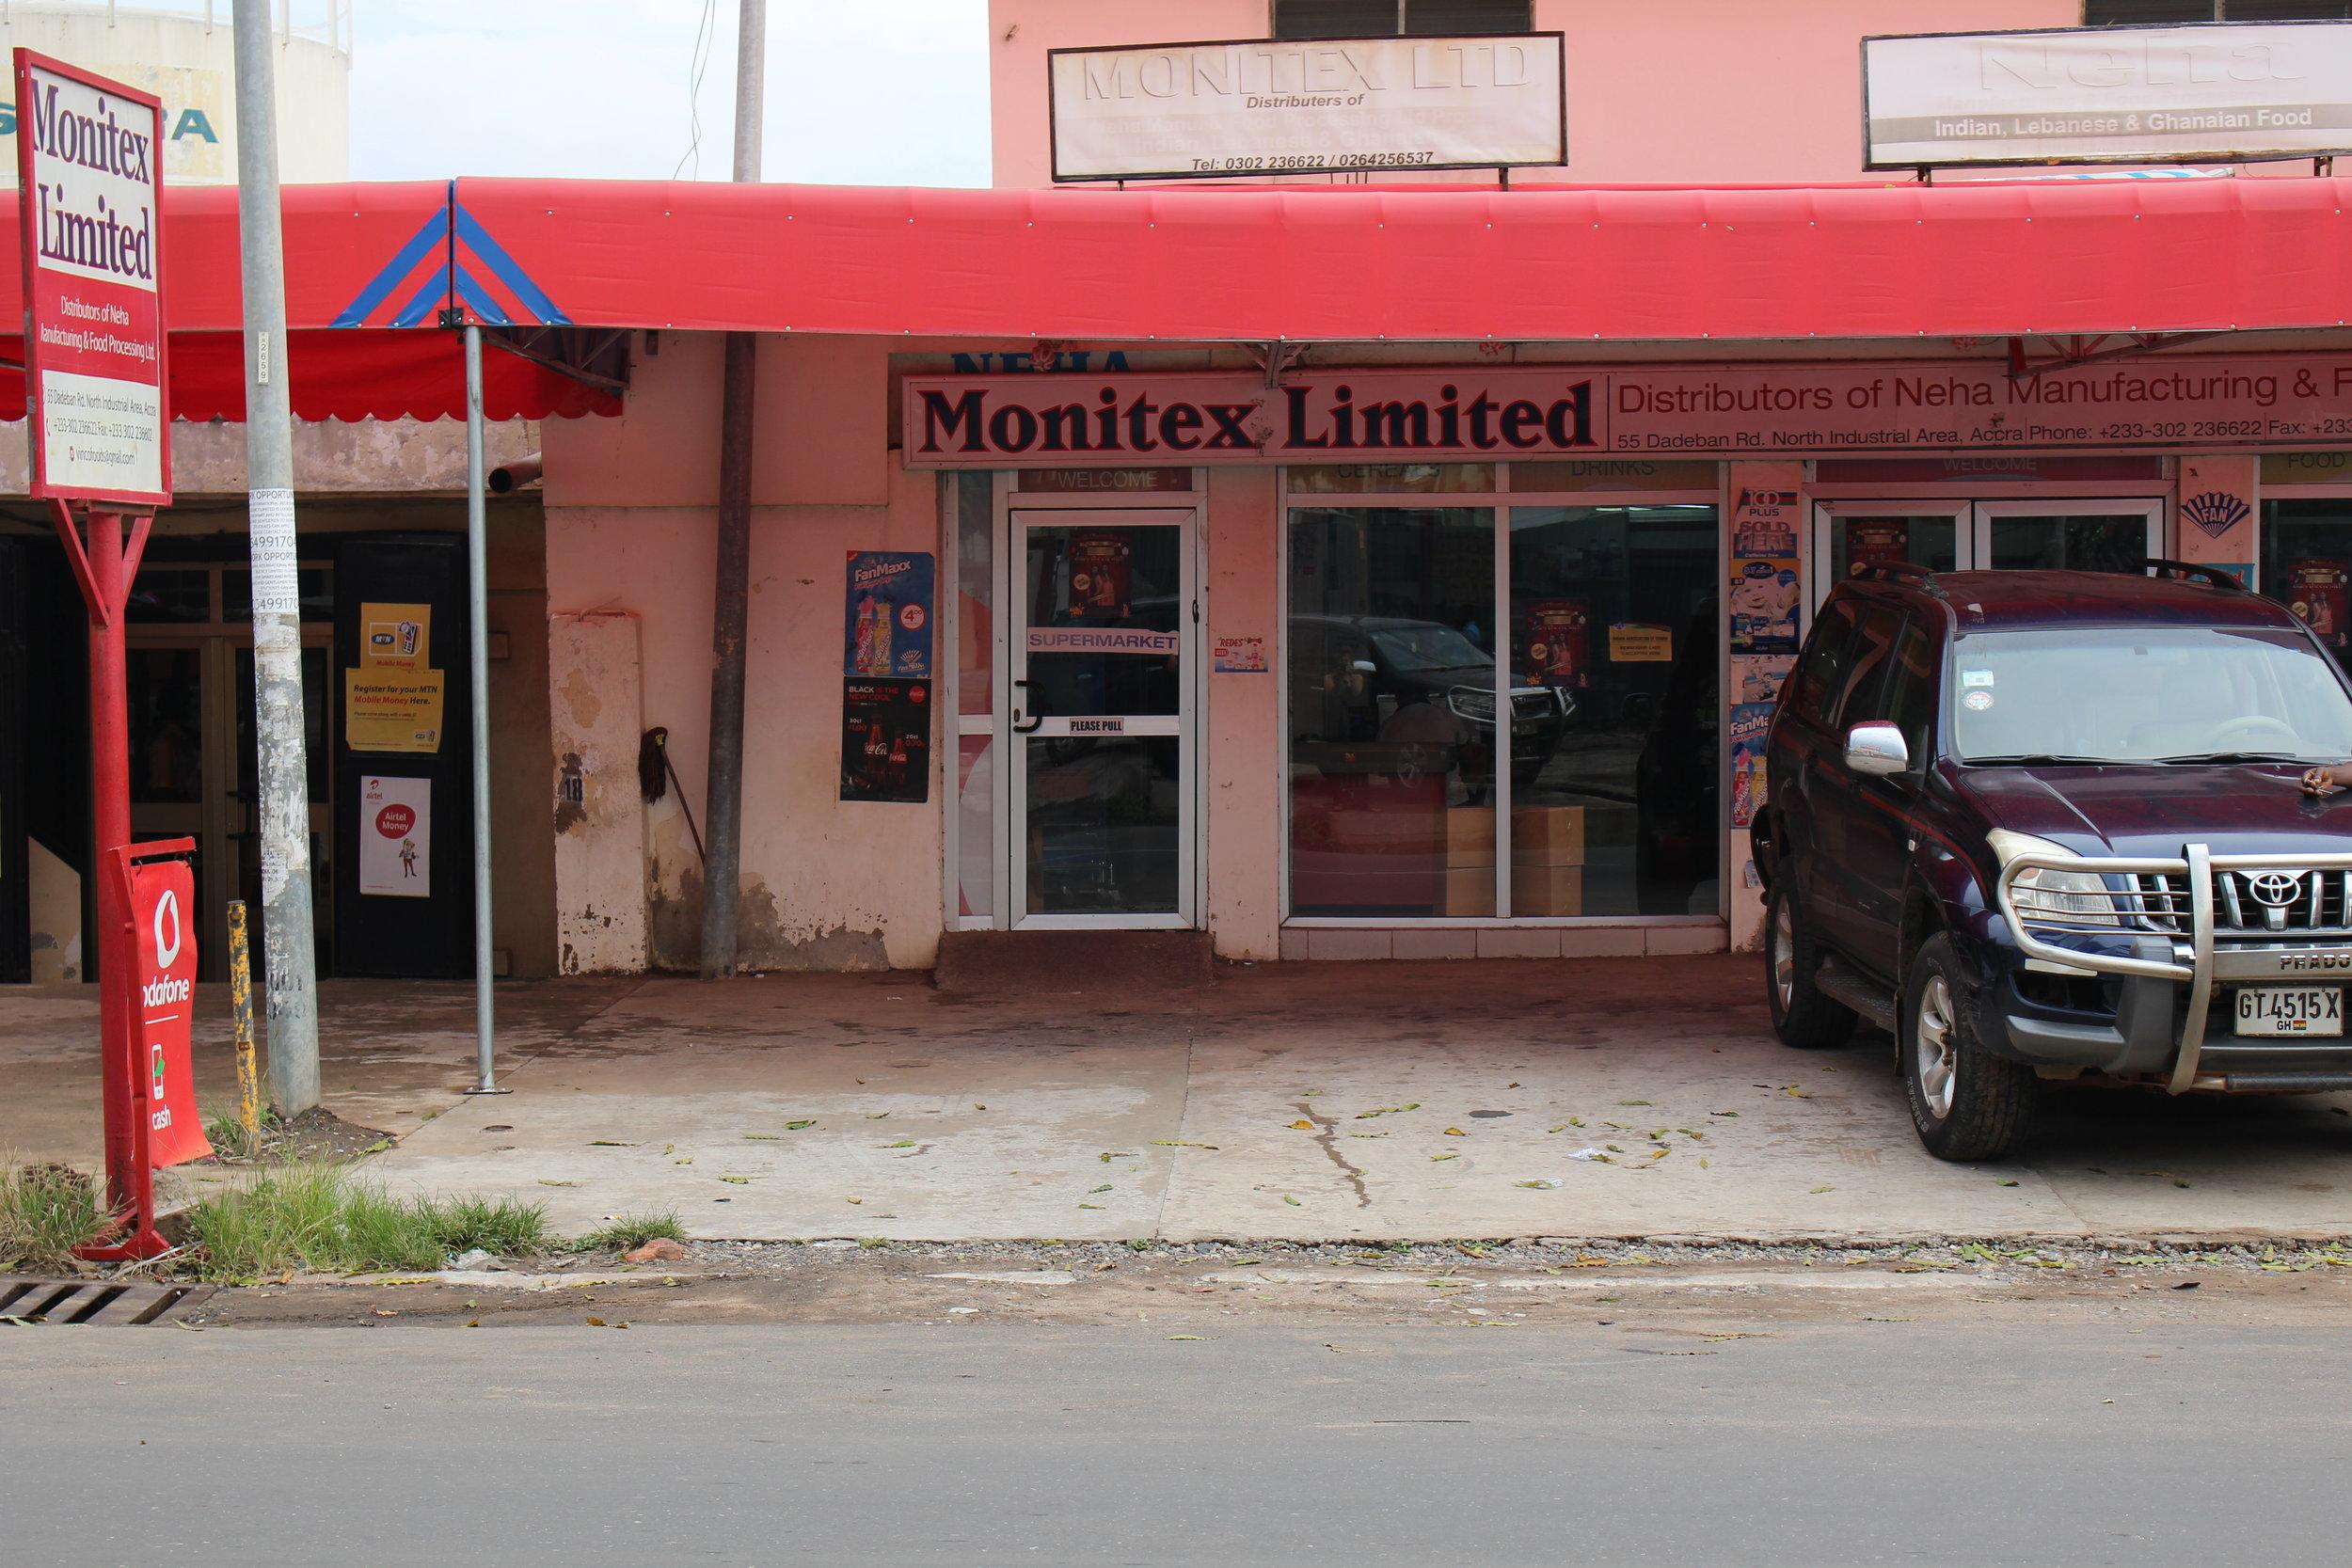 Monetix   55 Dadeban Road, North Industrial Area  030 223 6622